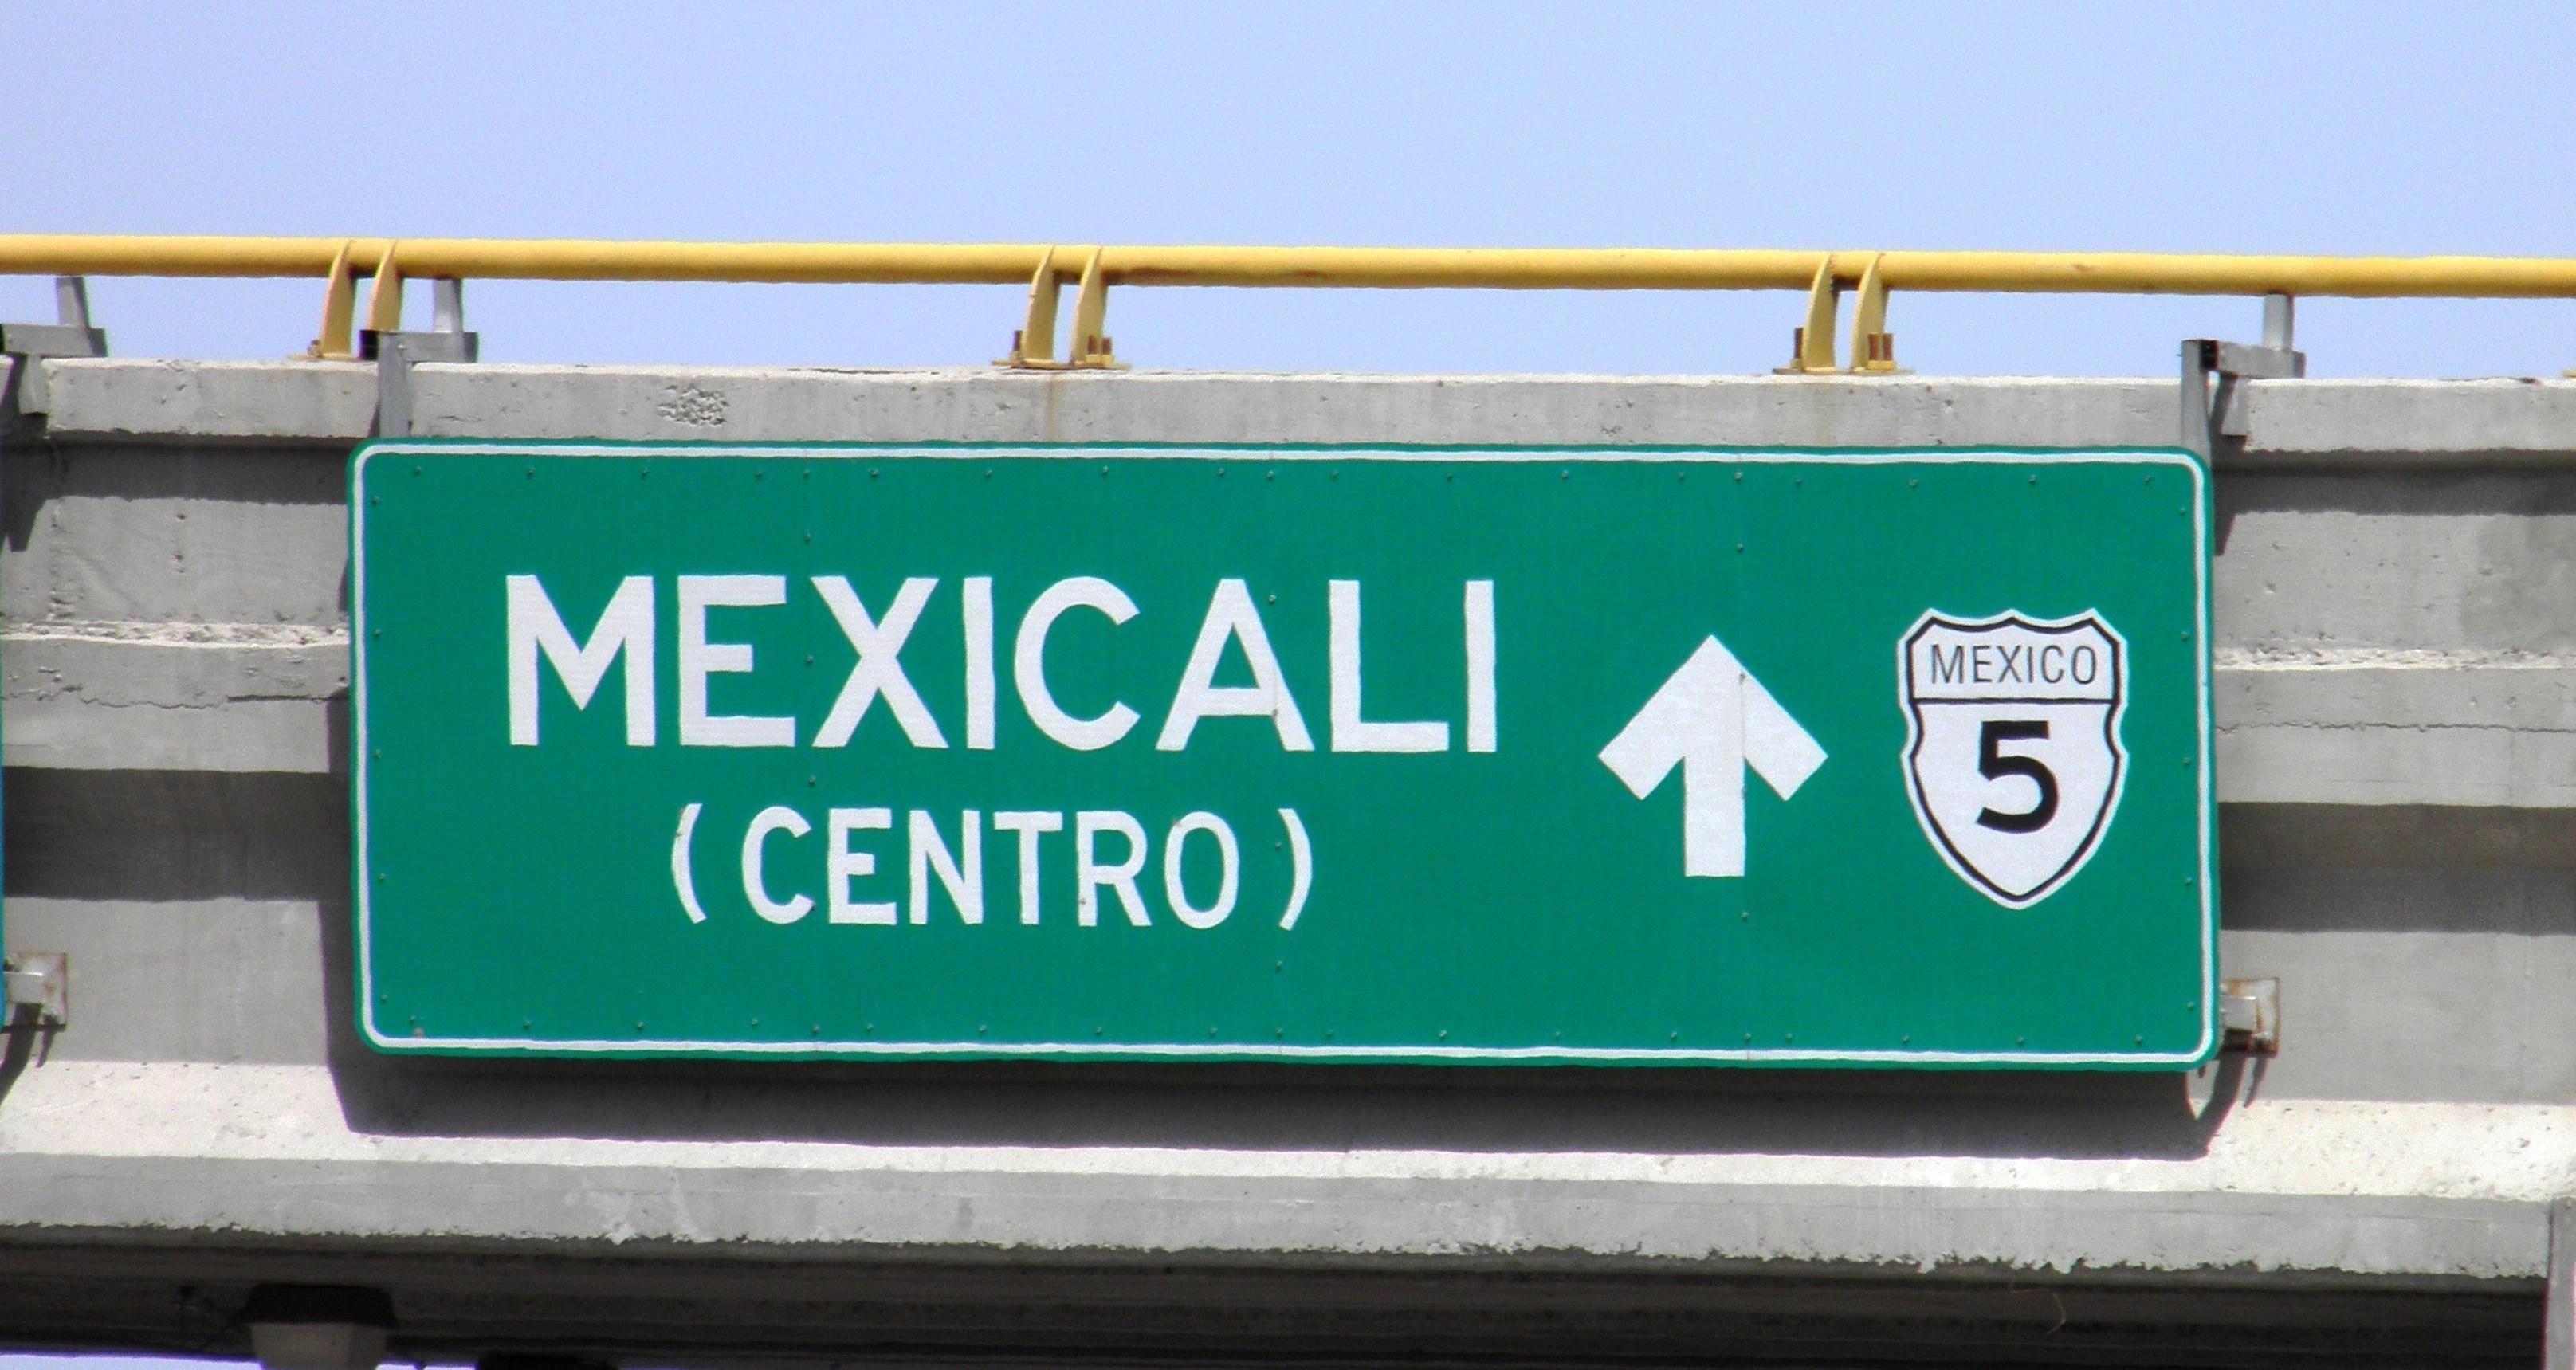 Mexicali sede de Cumbre Internacional de Negocios de Turismo Médico en 2013